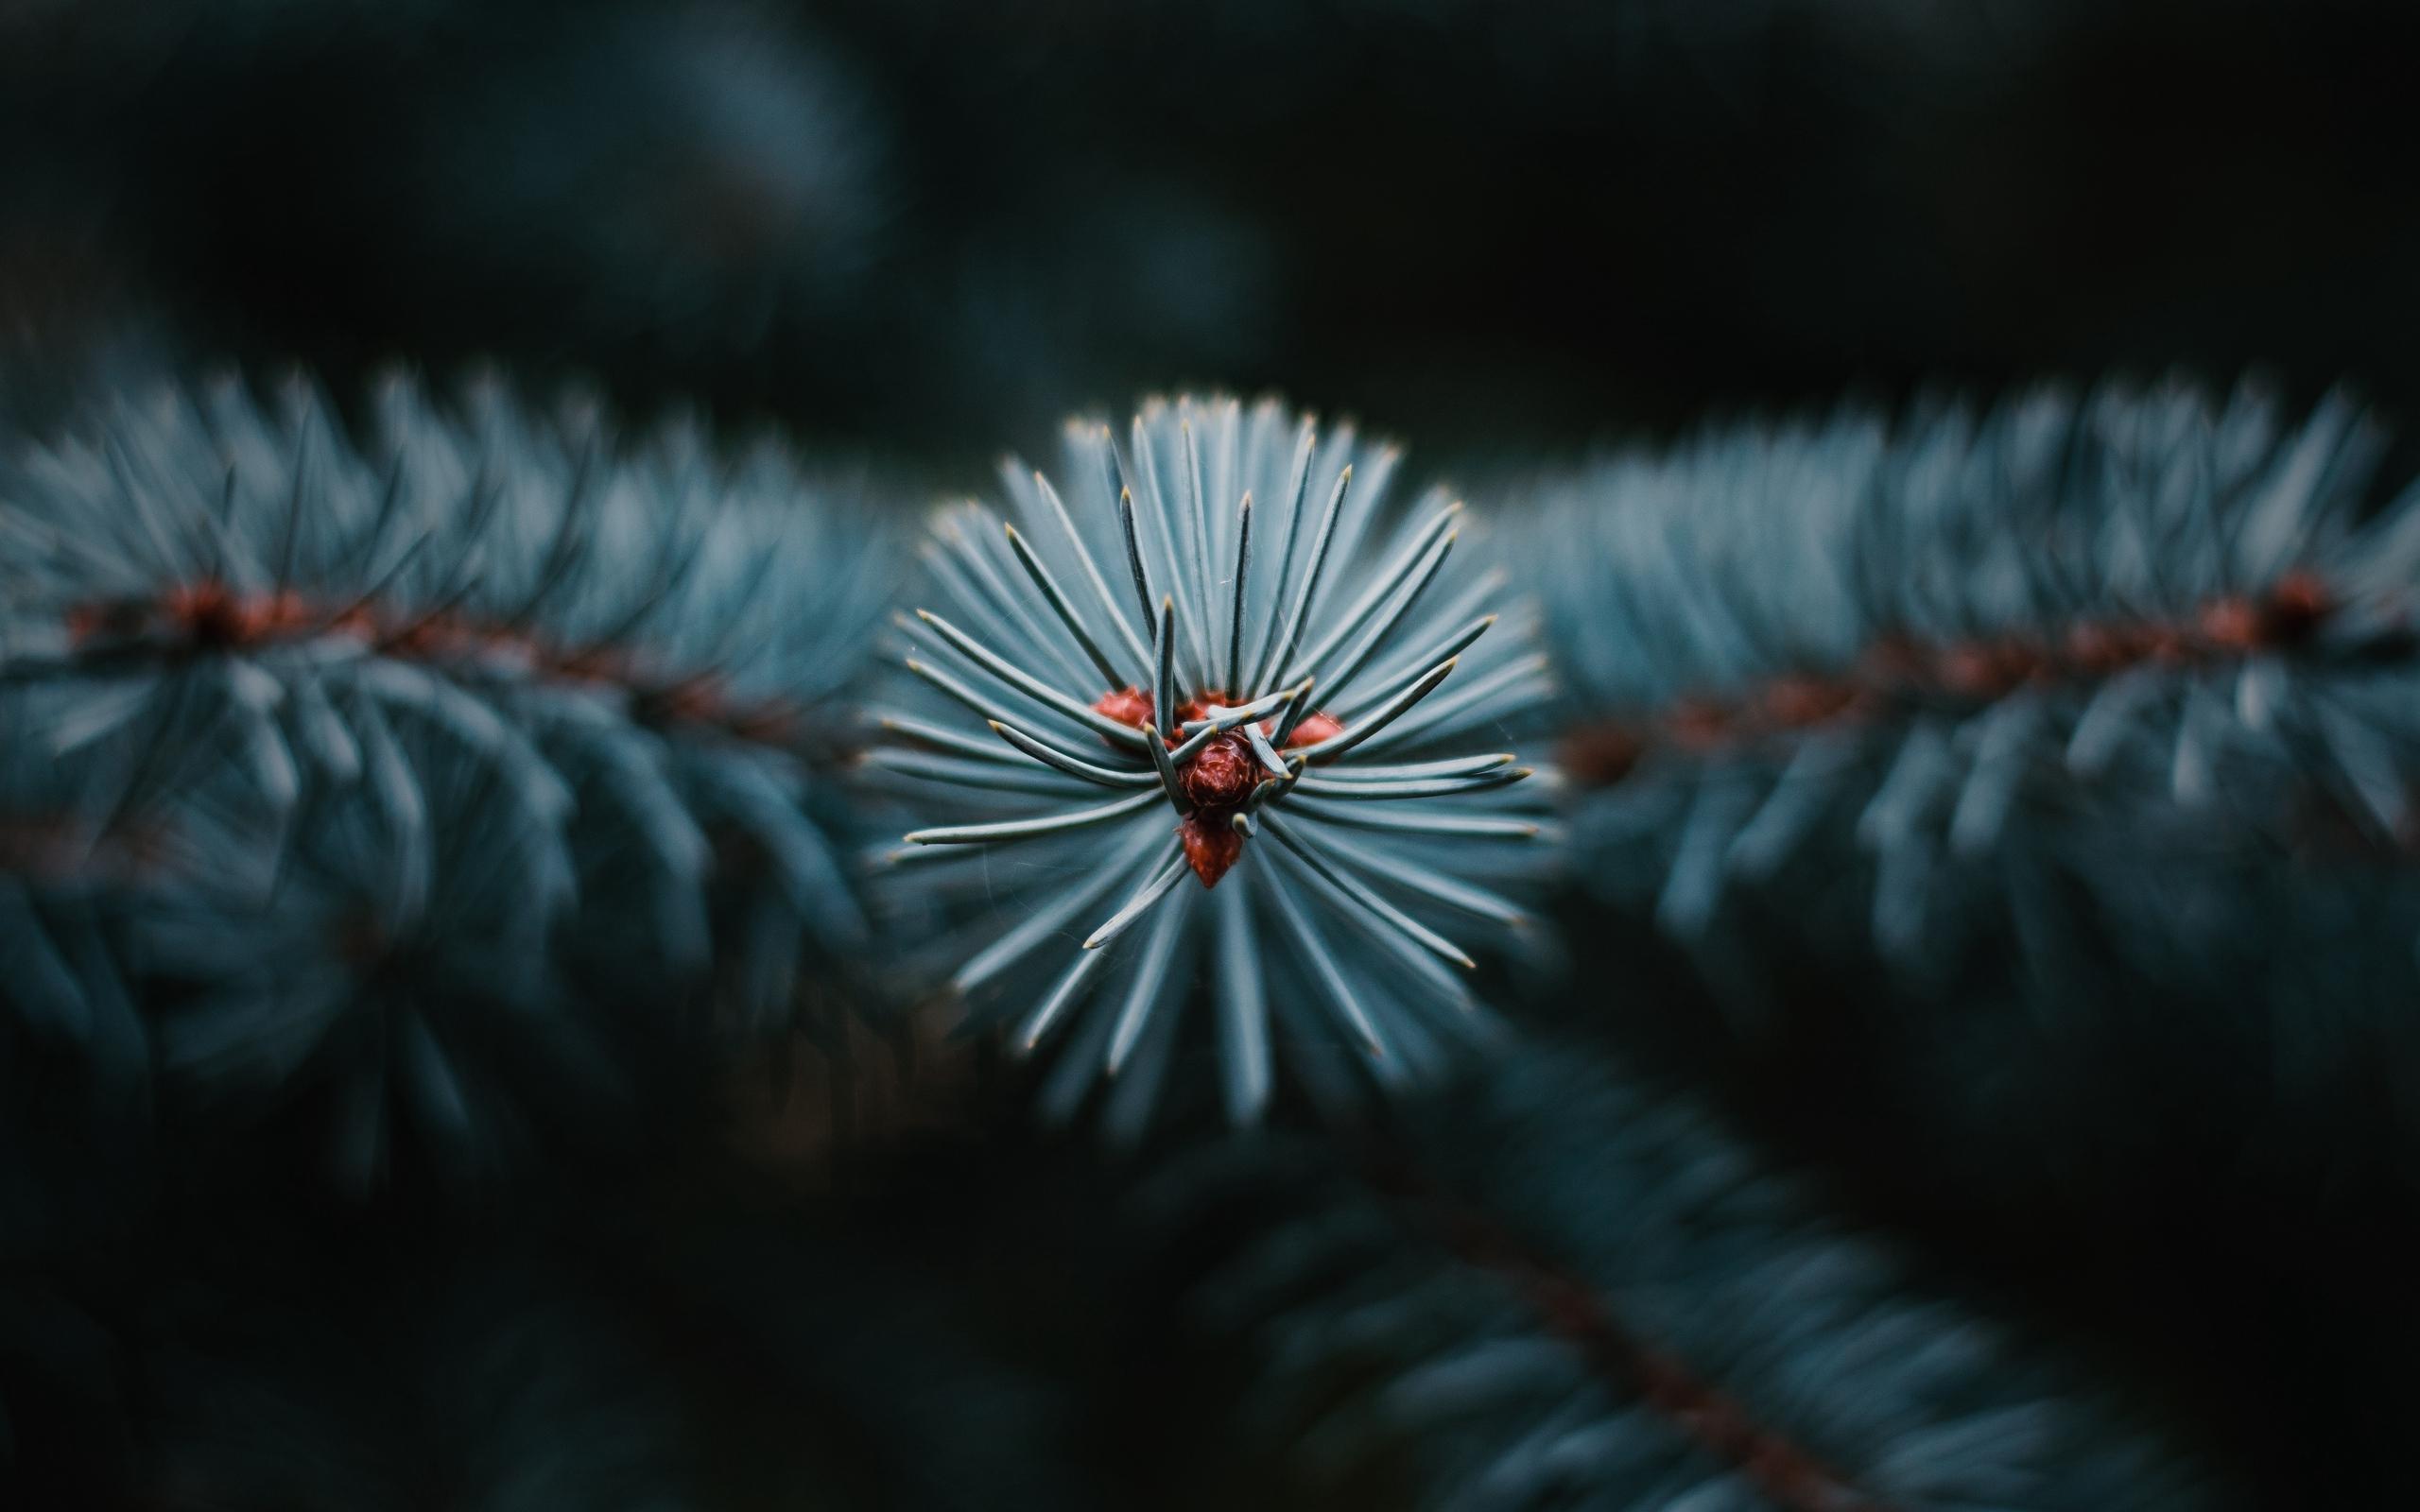 pine trees trees branch needles nature